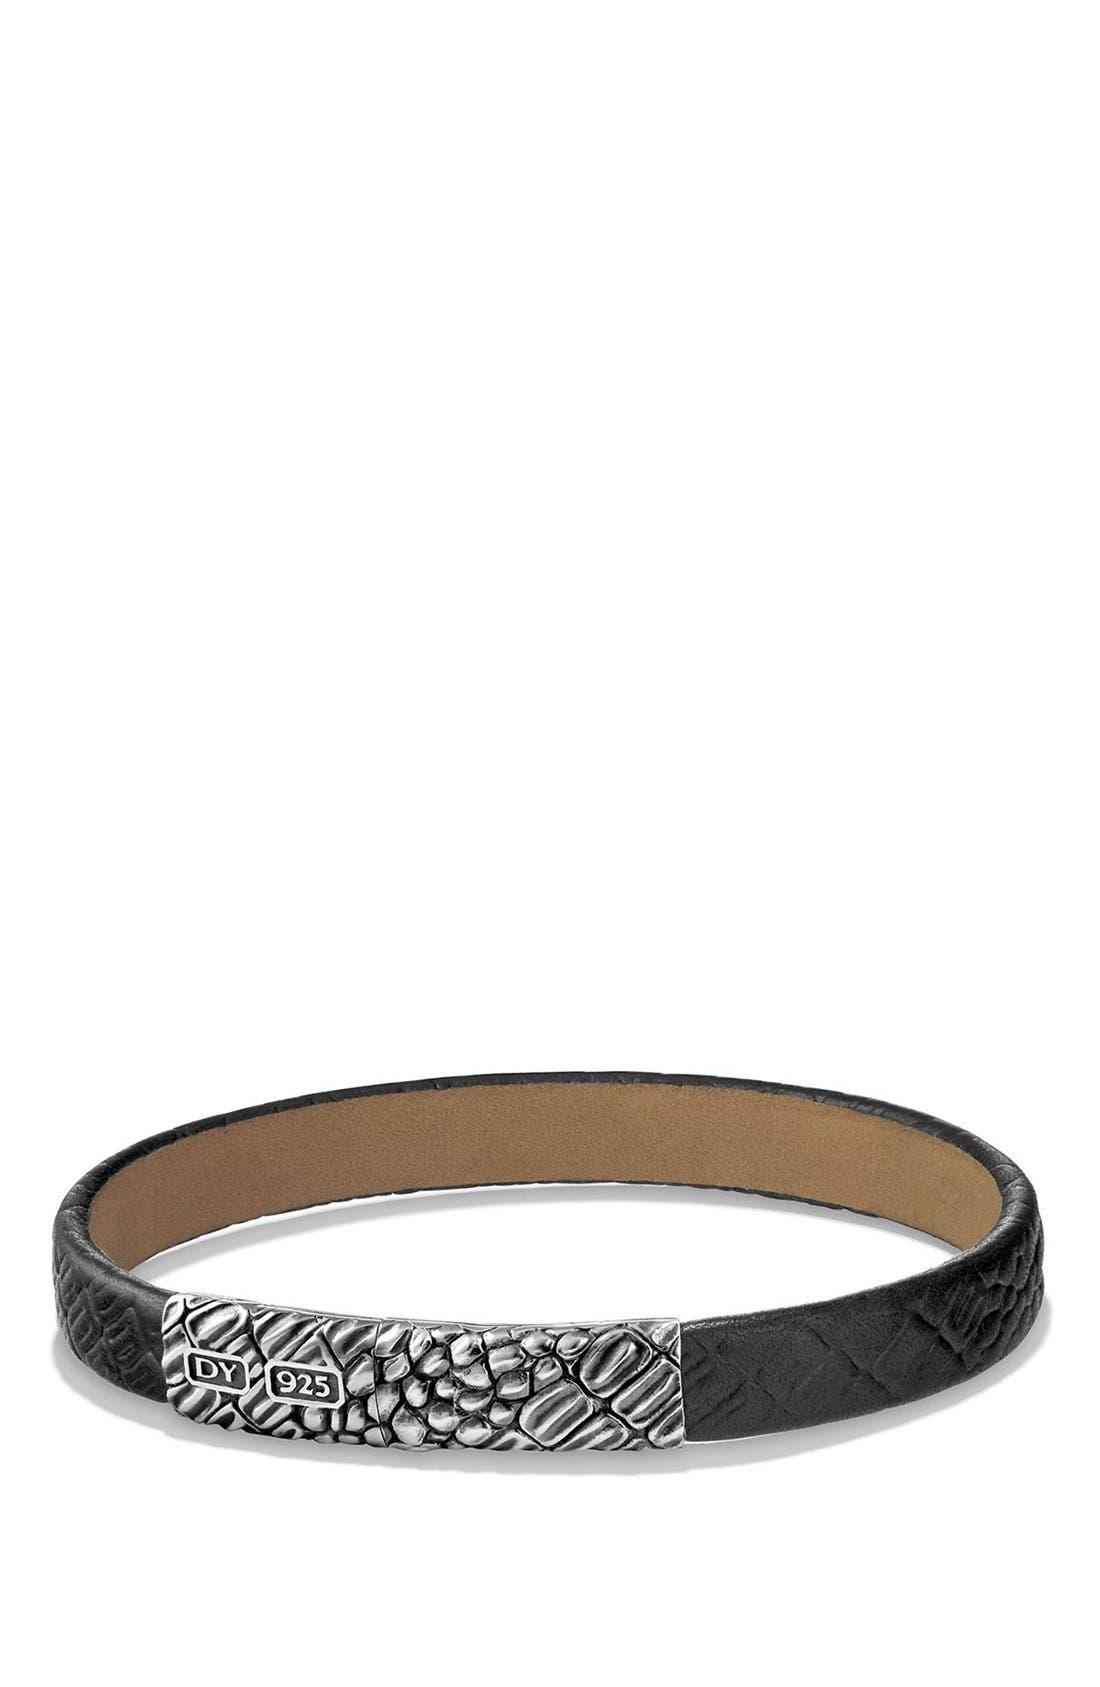 Gator Leather Bracelet,                             Main thumbnail 1, color,                             Silver/ Black Leather